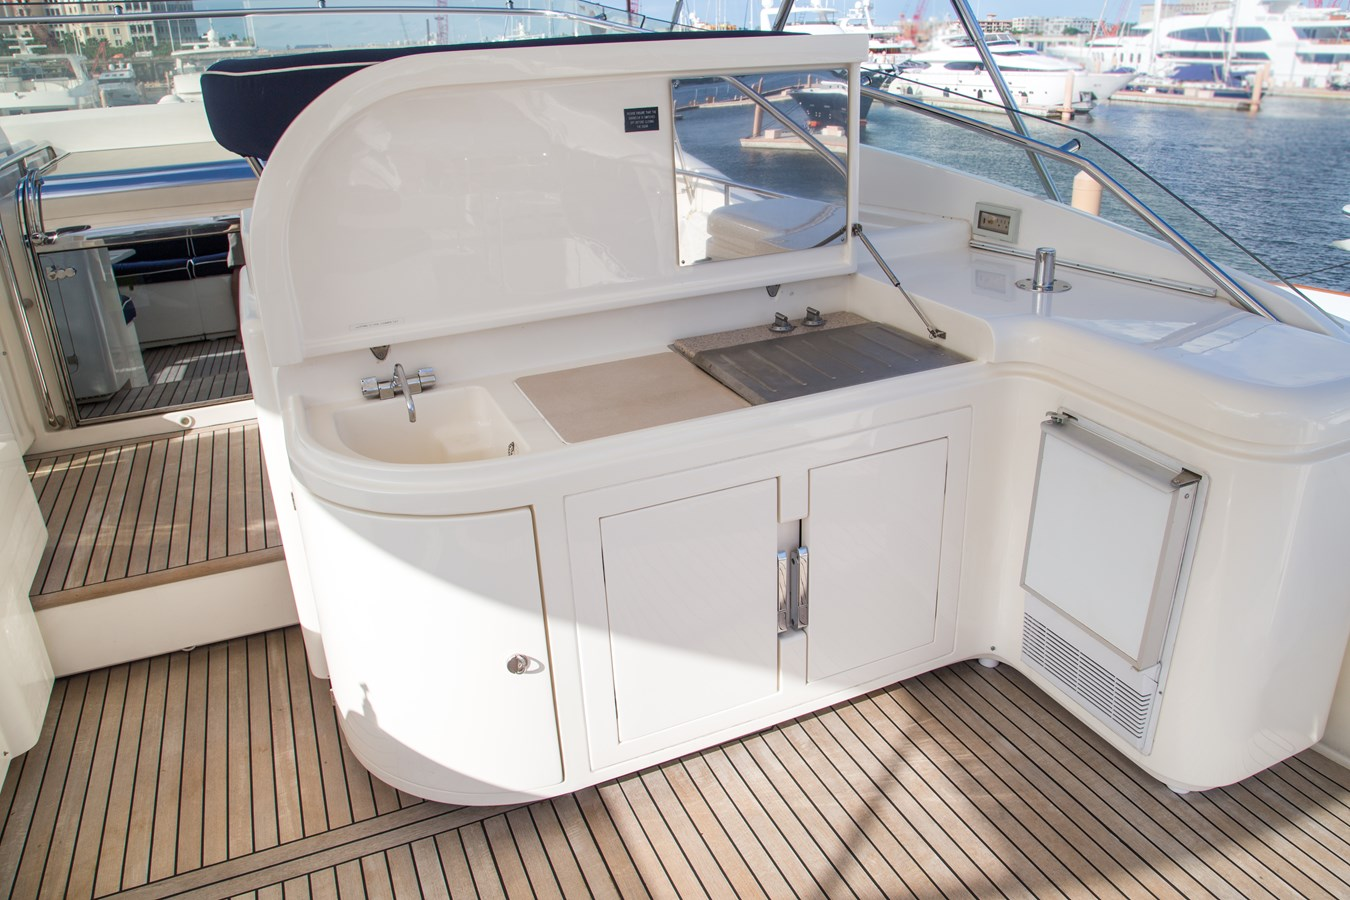 Flybridge BBQ, Sink, Ice Maker and Refrigeration 2003 FERRETTI YACHTS Custom Flybridge Motor Yacht 2710342